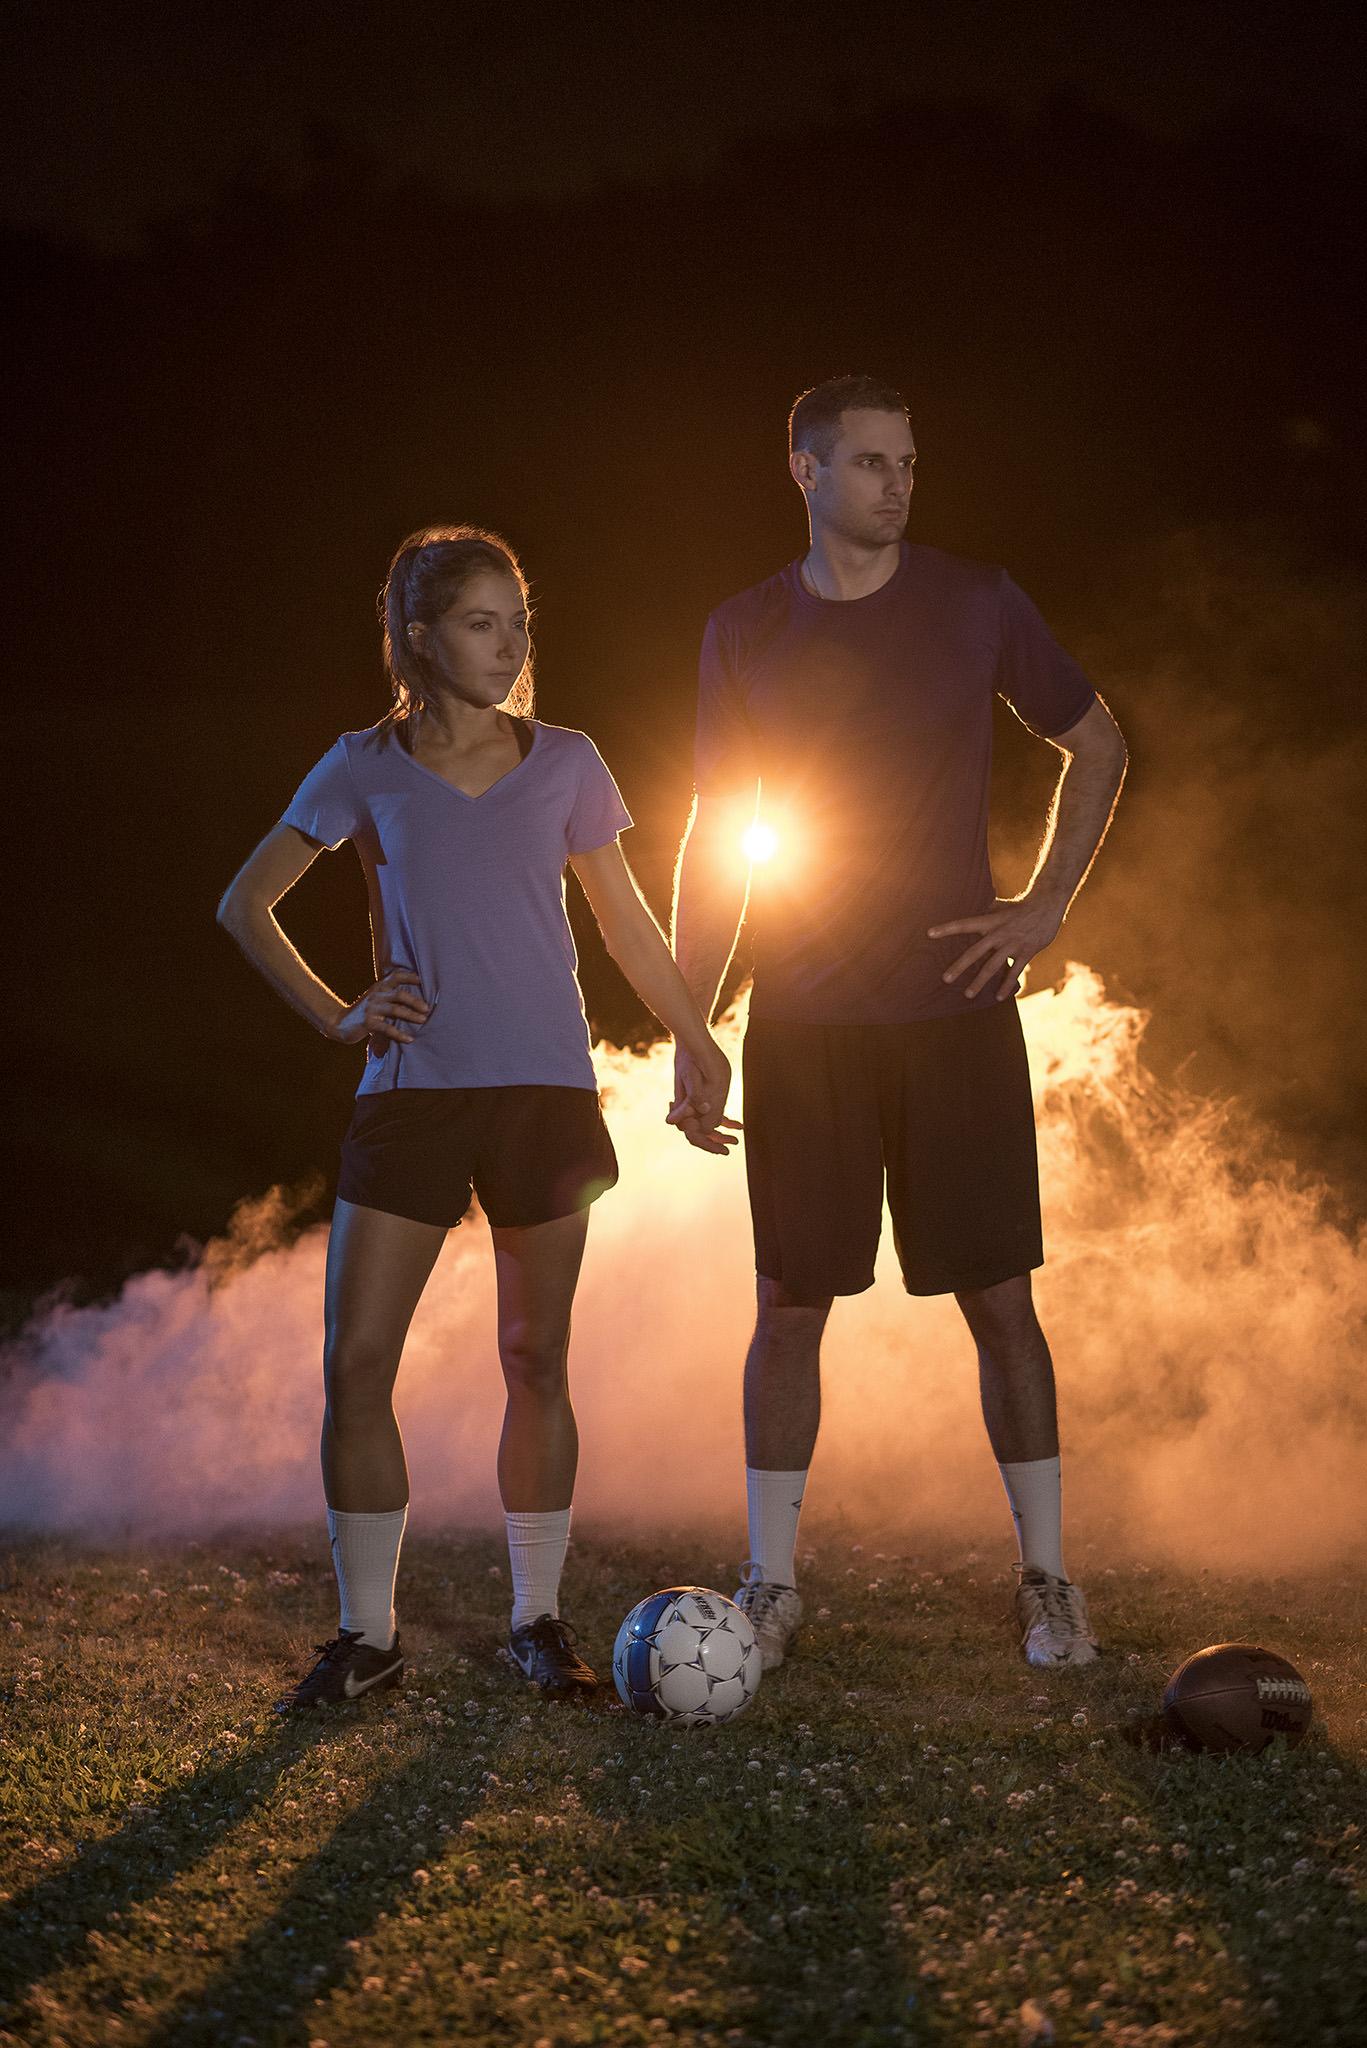 Missouri-city-lifestyle-engagement-photographer-houston-physical-therapist-sports-fitness-football-